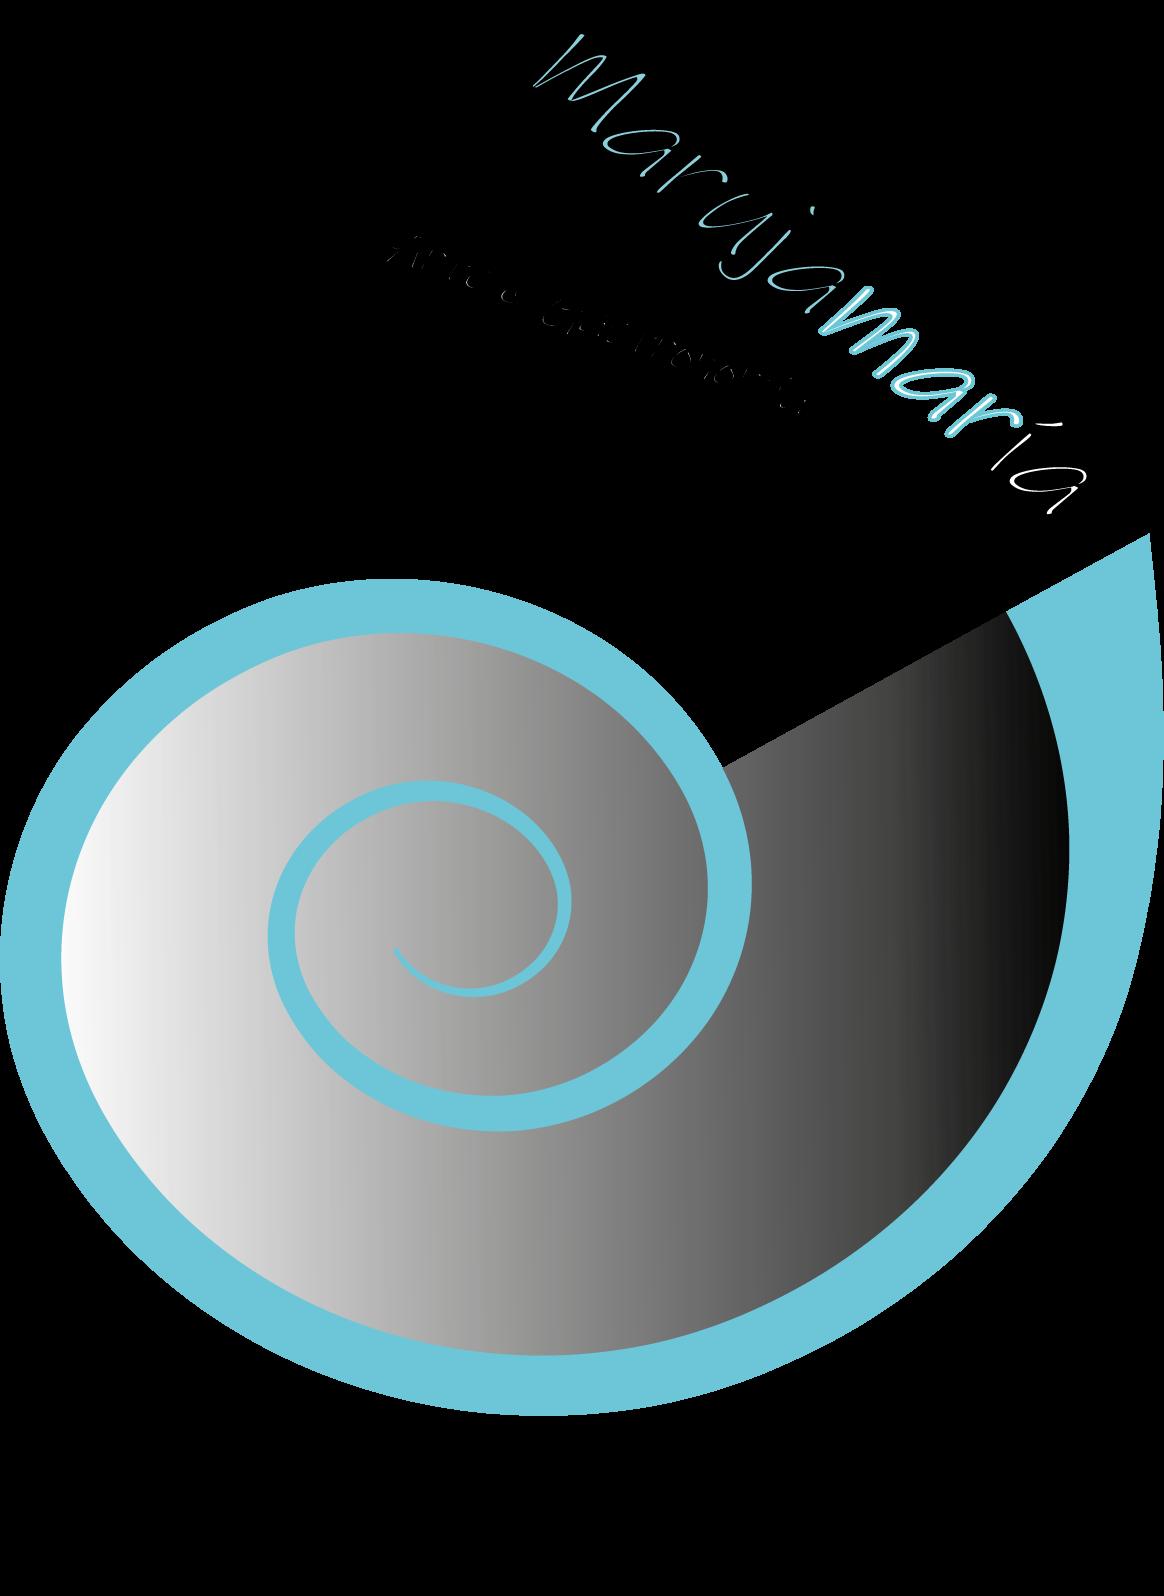 Logotipo O COLMADO DE MARUJA MARÍA